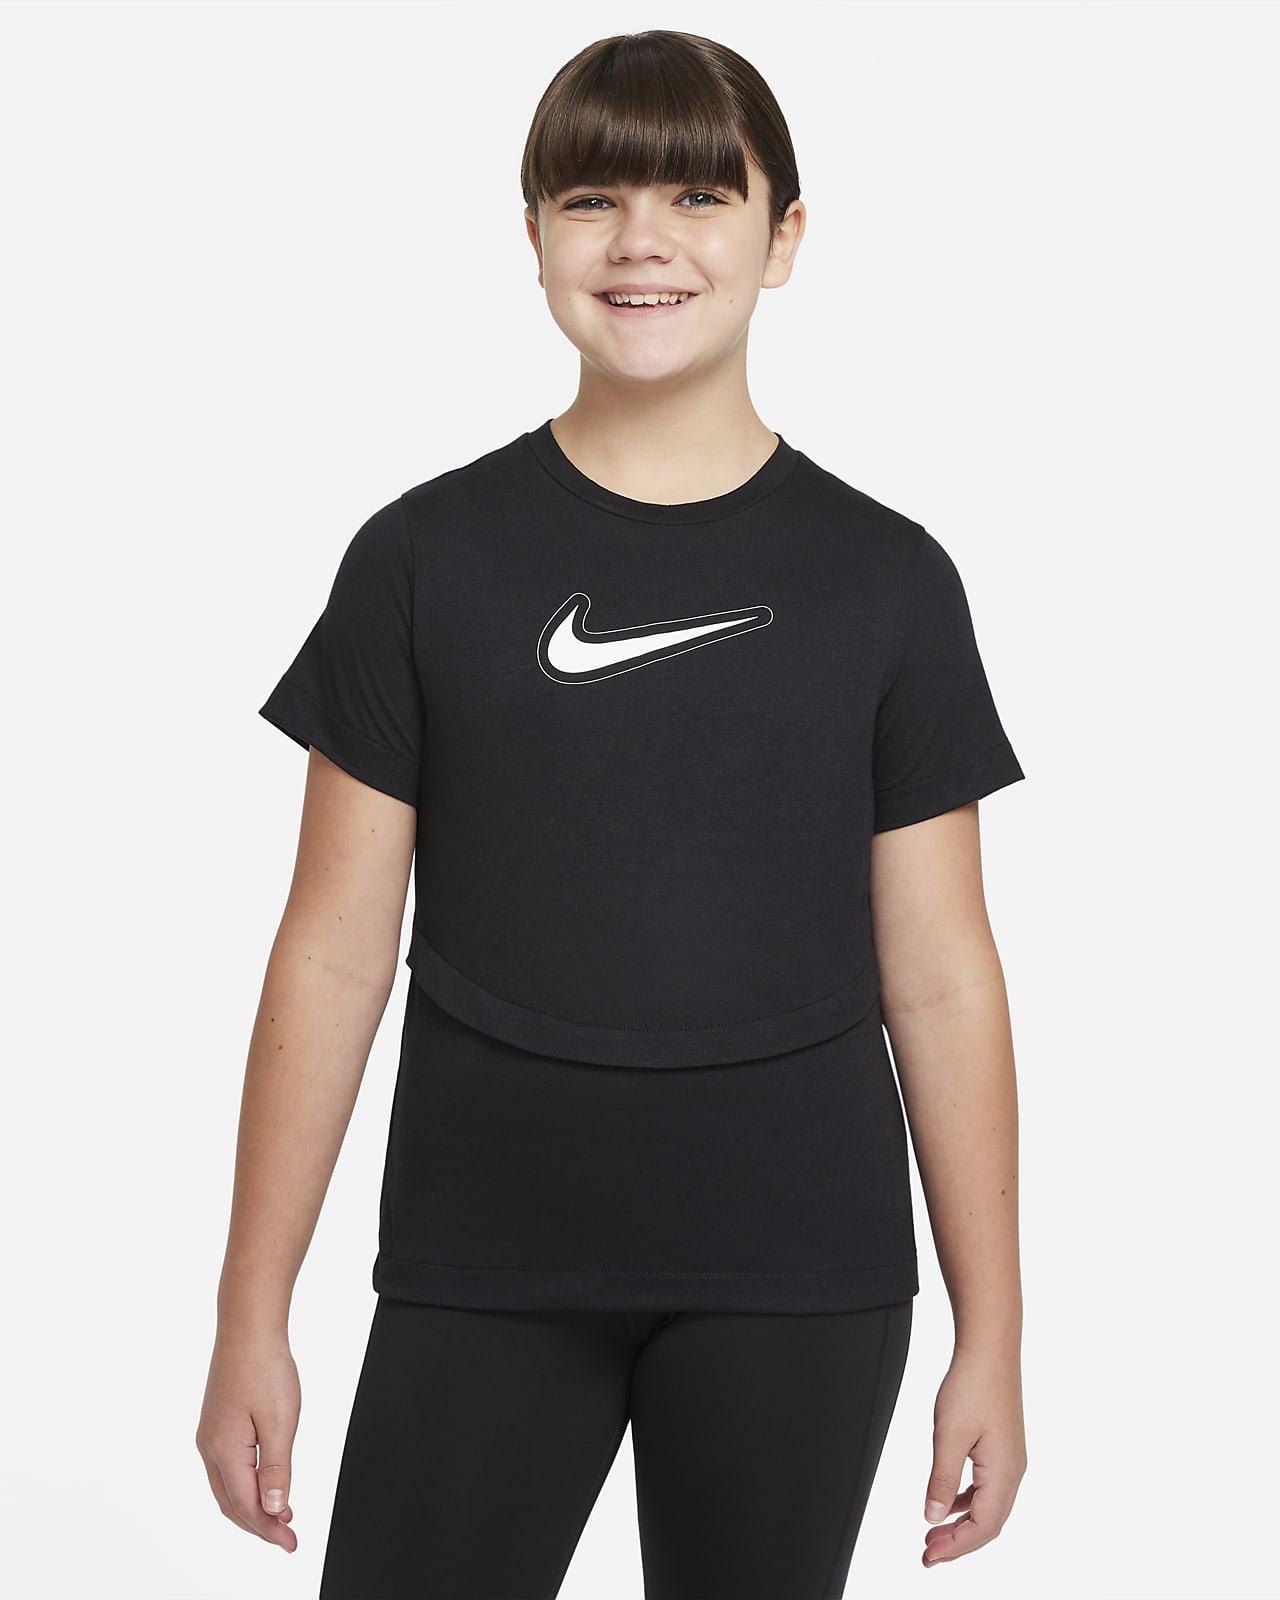 Camiseta de entrenamiento de manga corta para niña talla grande Nike Dri-FIT Trophy (talla extendida)